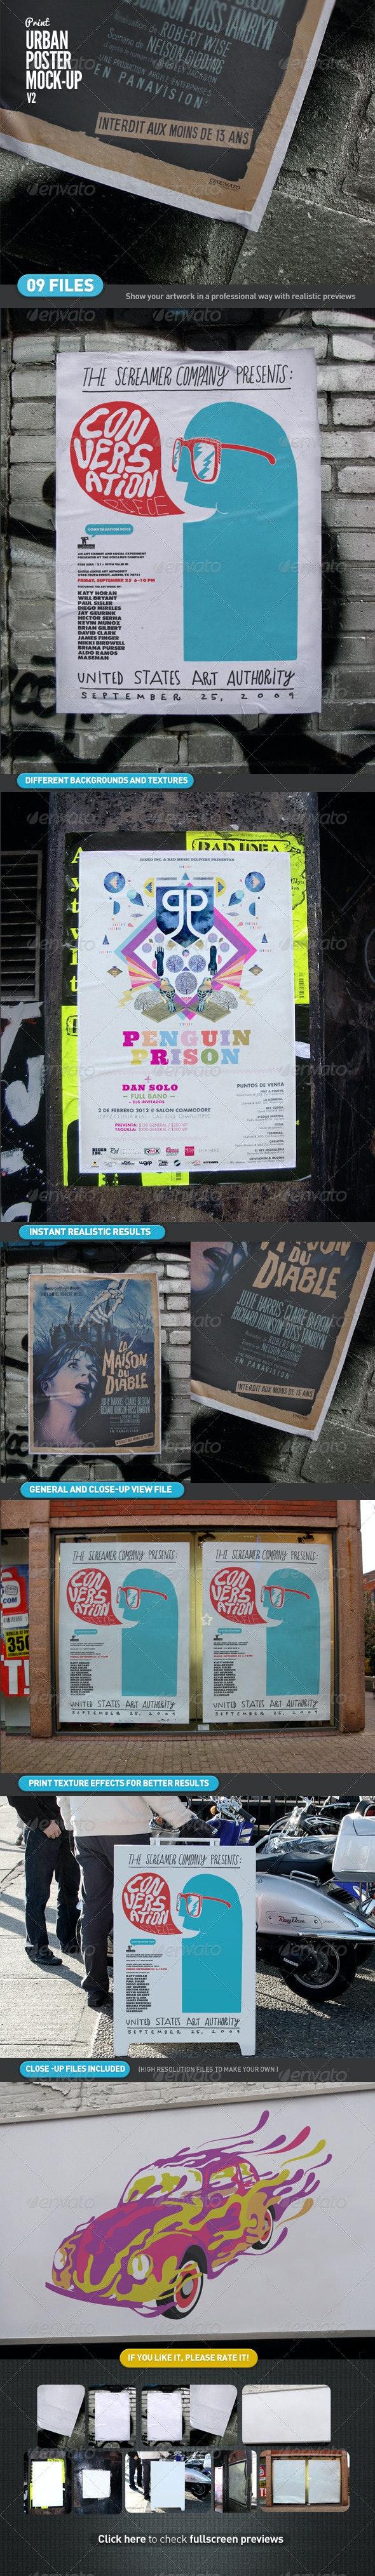 Urban Poster Mock-Up v2 - Posters Print